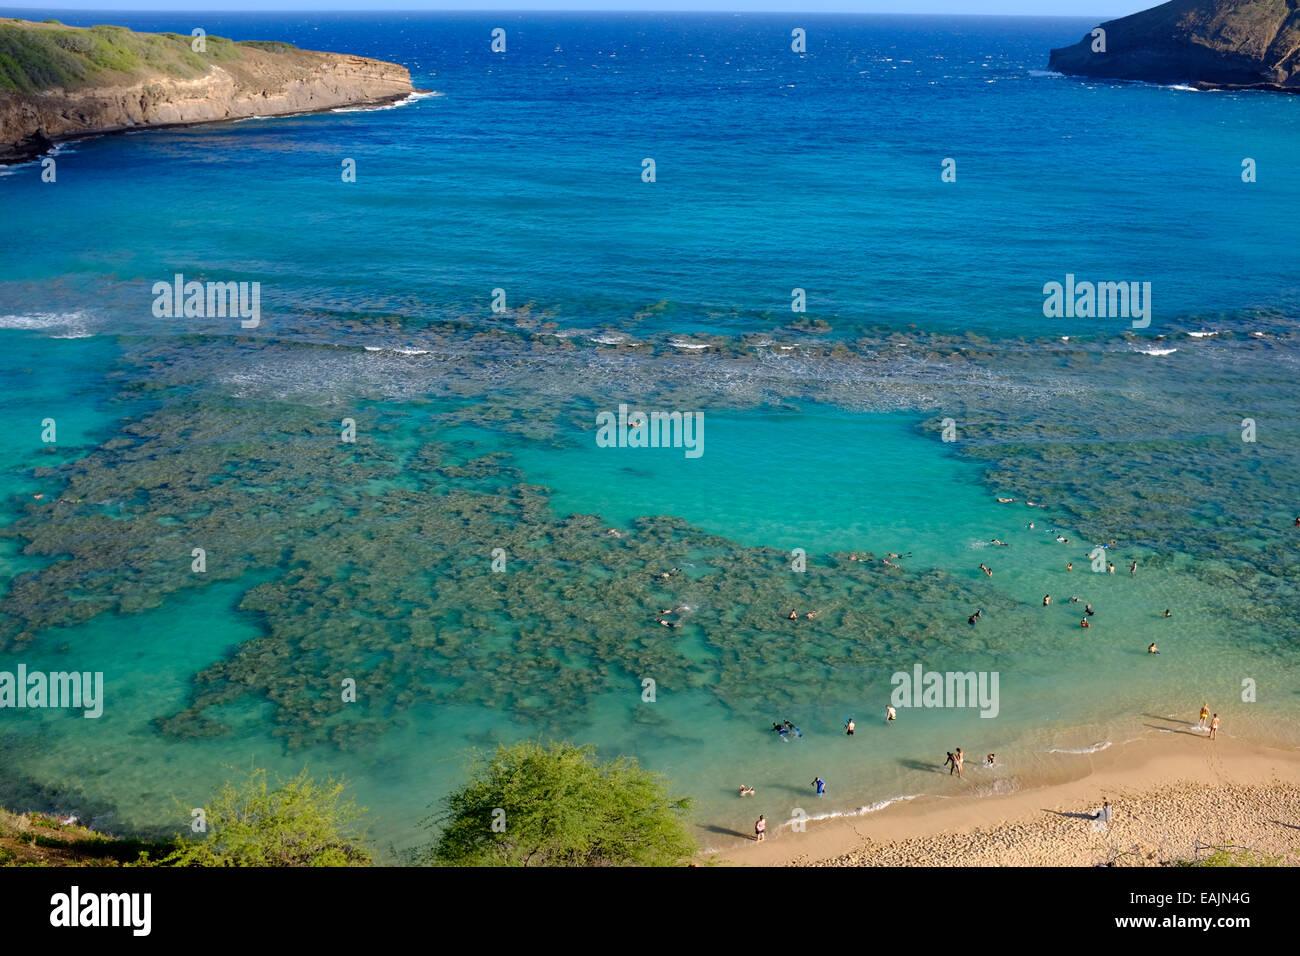 Hanauma Bay Nature Preserve, Oahu, Hawaii - Stock Image